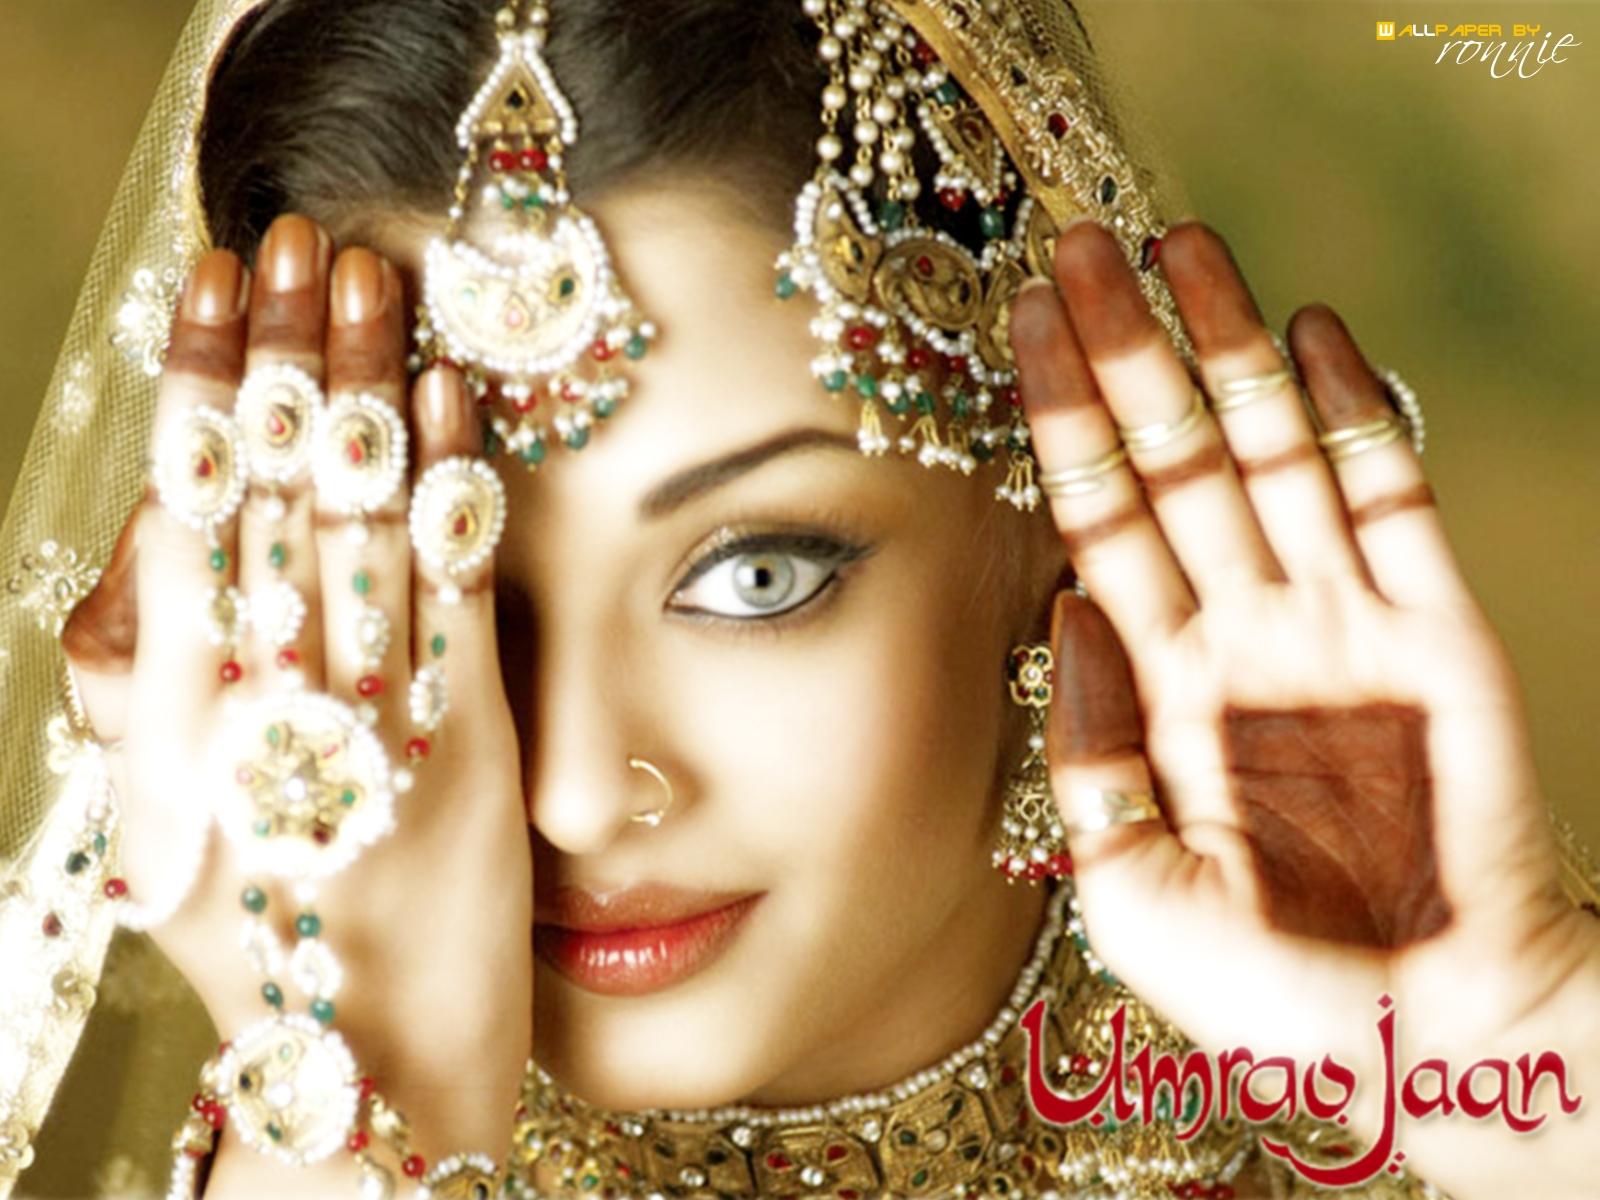 http://3.bp.blogspot.com/-wuq-BusYlhg/TpLSb-_kUDI/AAAAAAAACSs/3osDq0Is828/s1600/Aishwarya+Rai+Umrao+Jaan.jpg